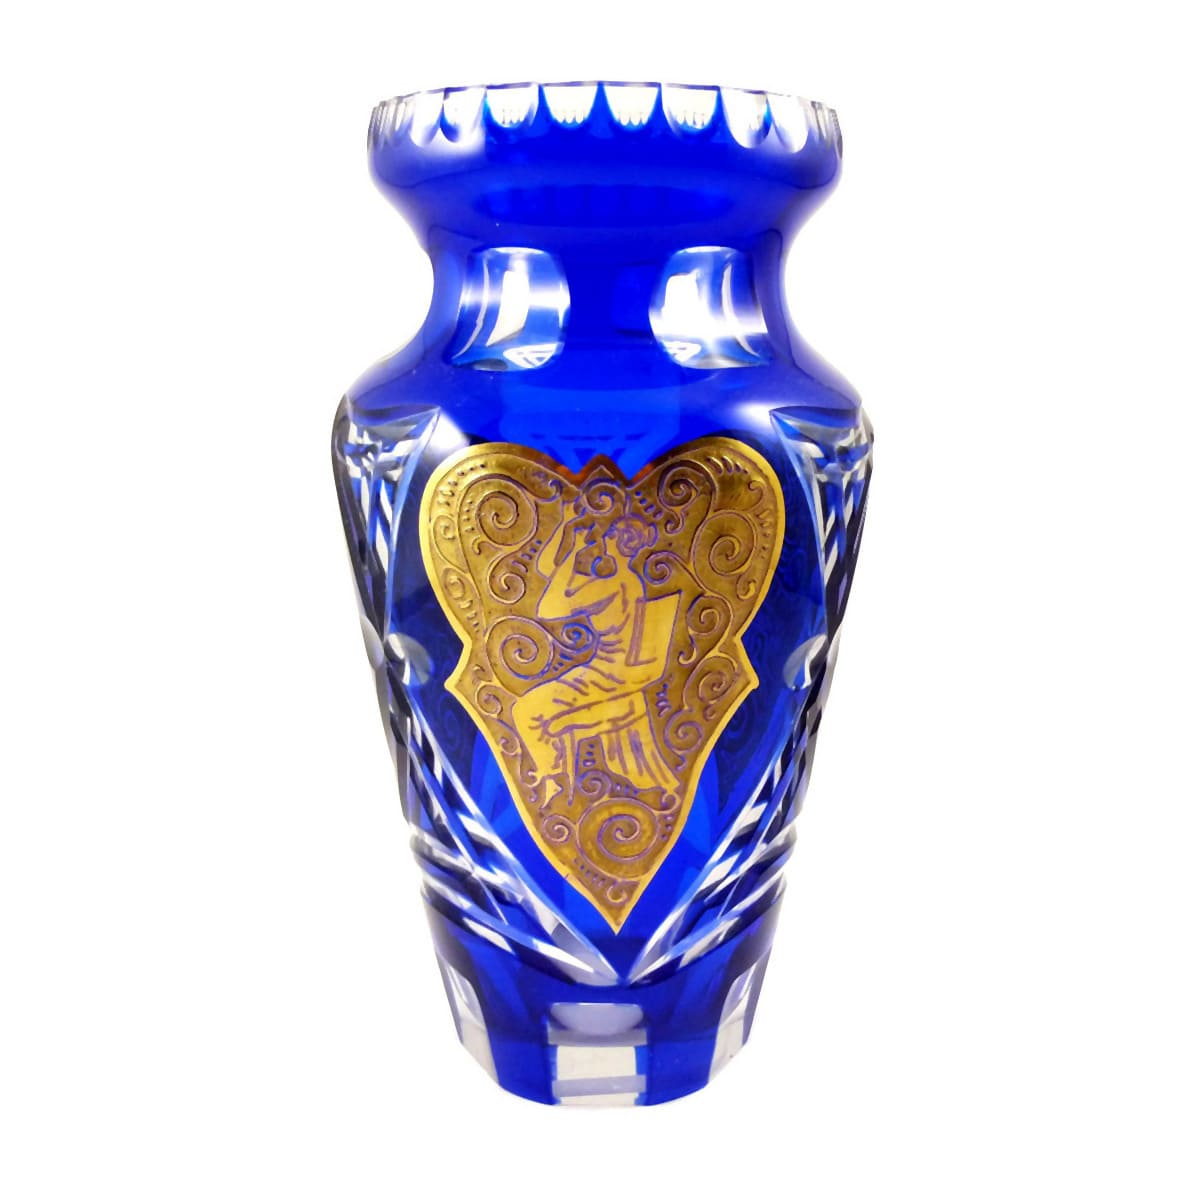 Vase-mit-vergoldeten-ornamentalen-Figurendekor-J-Oertel-in-Haida-um-1925